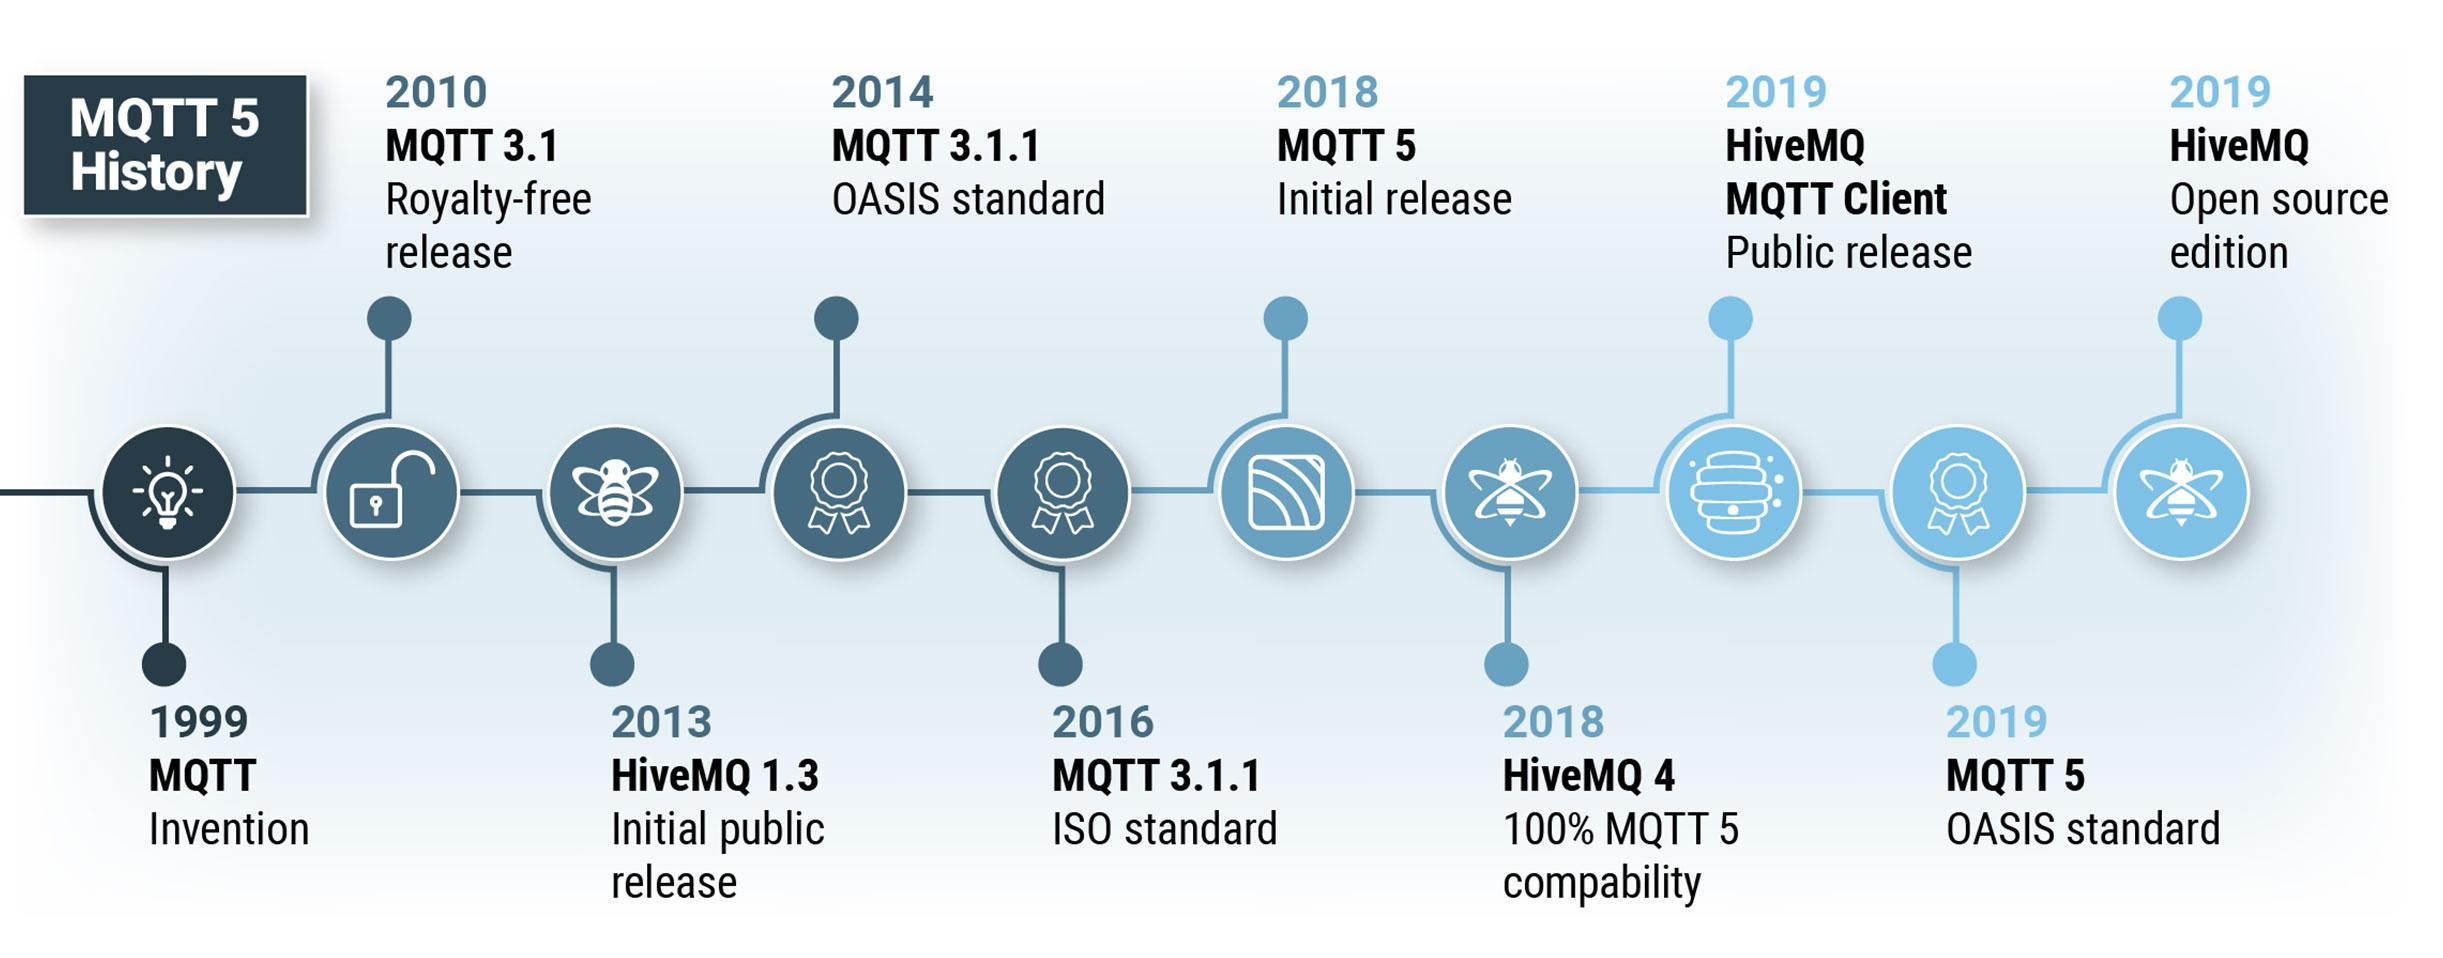 MQTT 5 Timeline